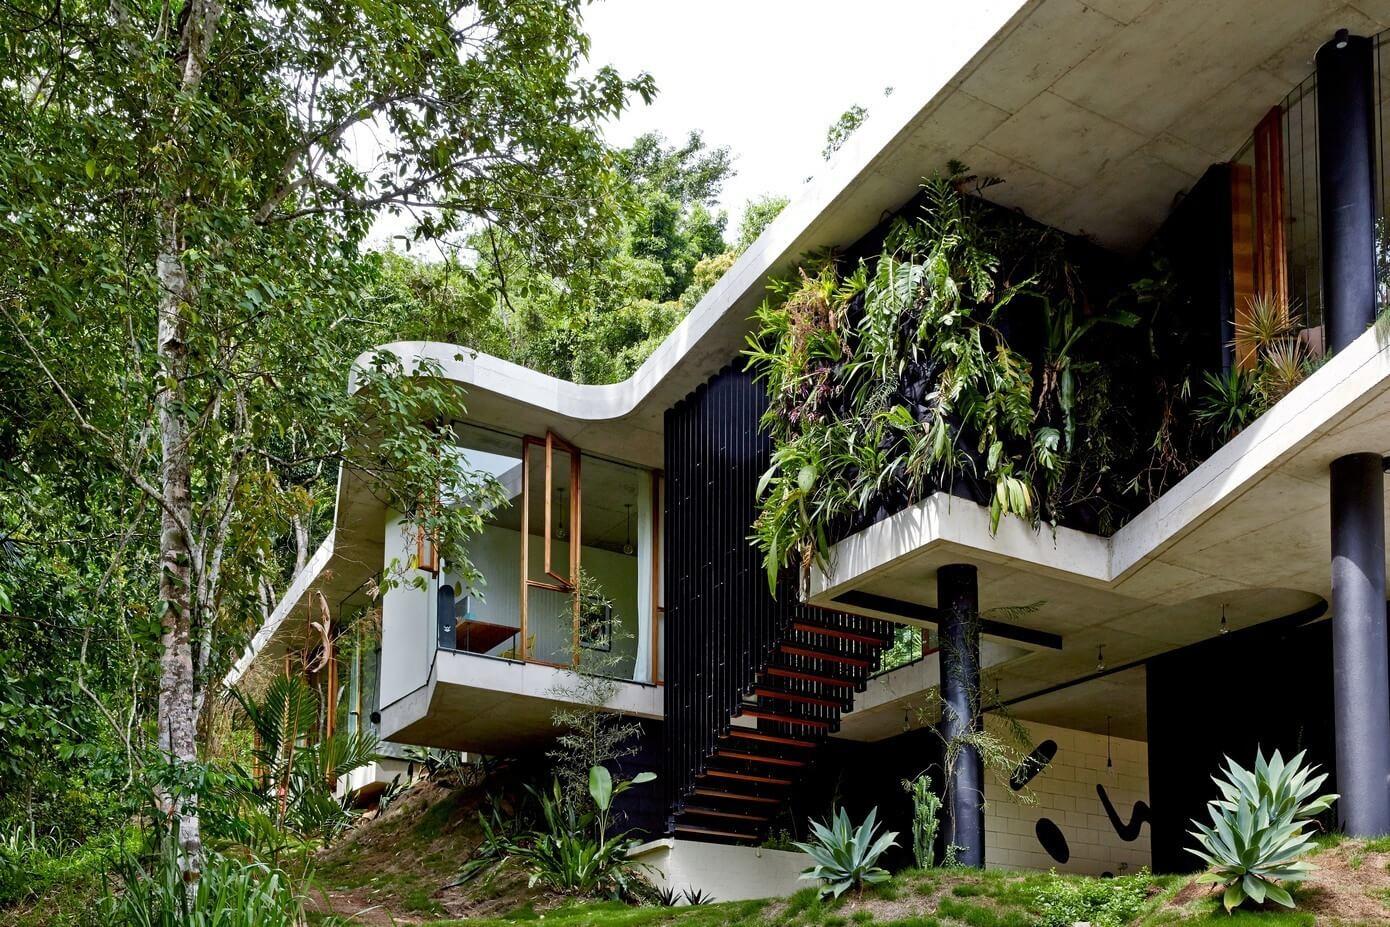 planchonella-house-jesse-bennett-architect-26